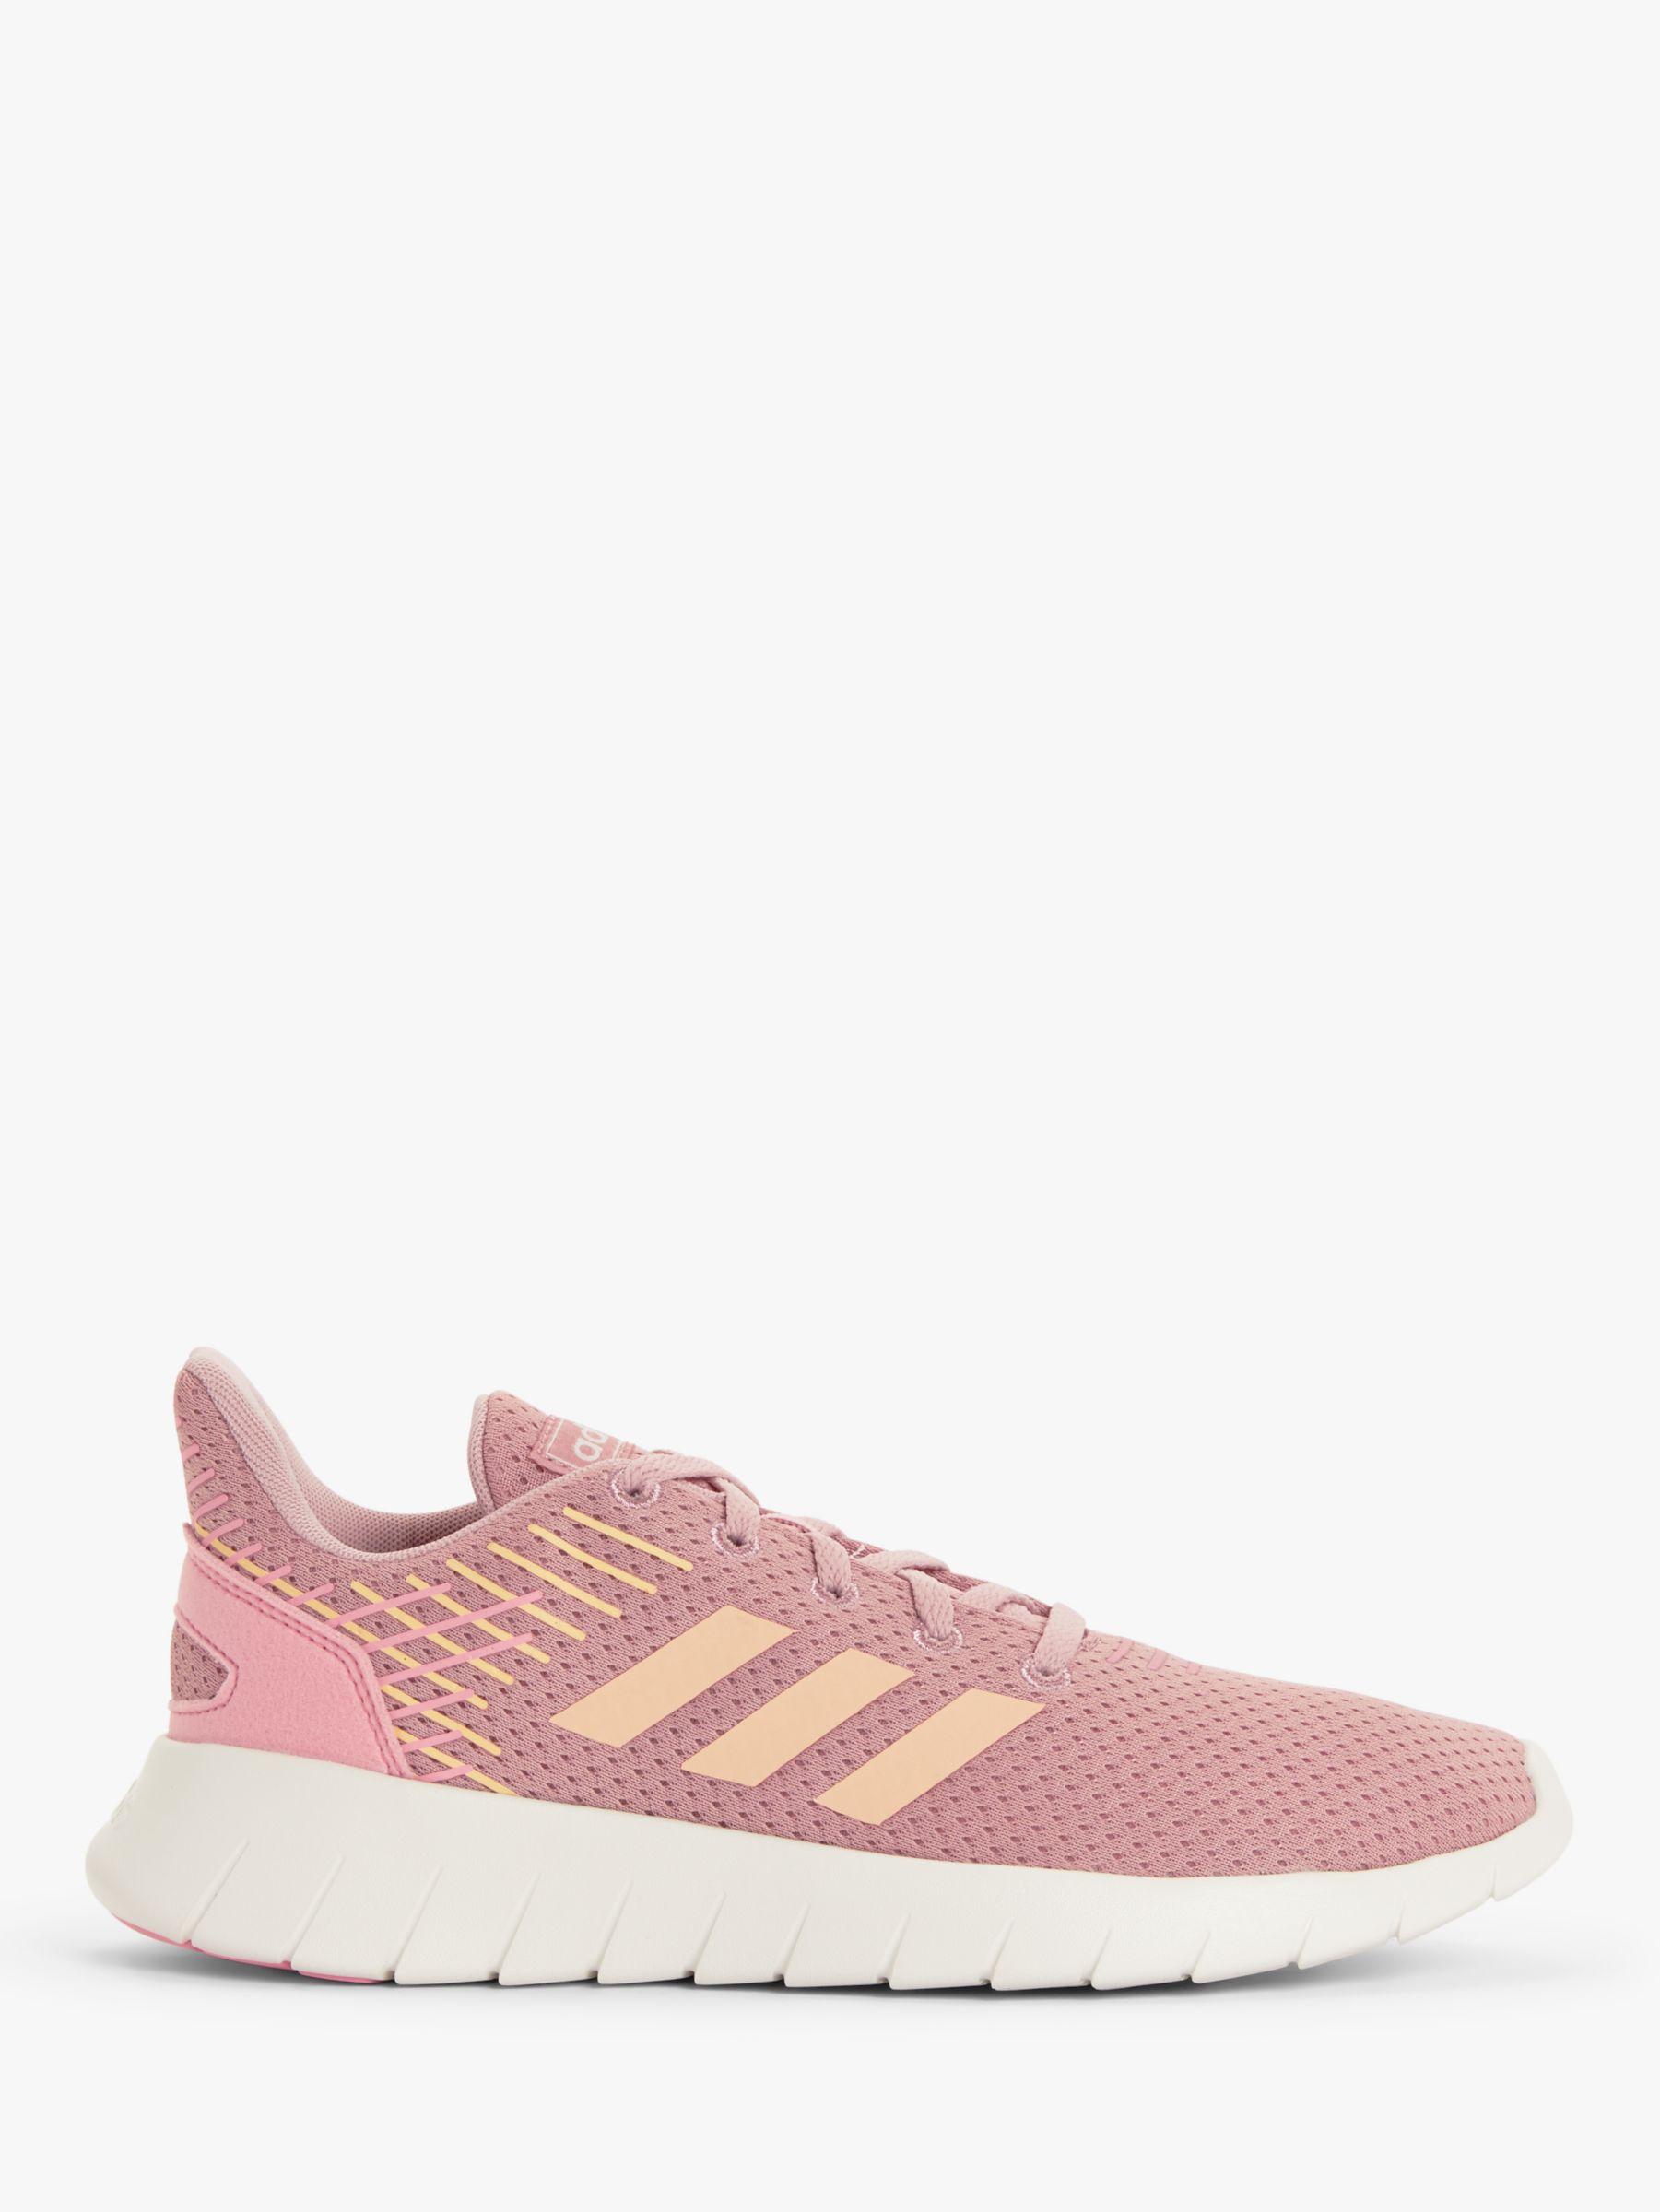 adidas Asweerun Women's Running Shoes